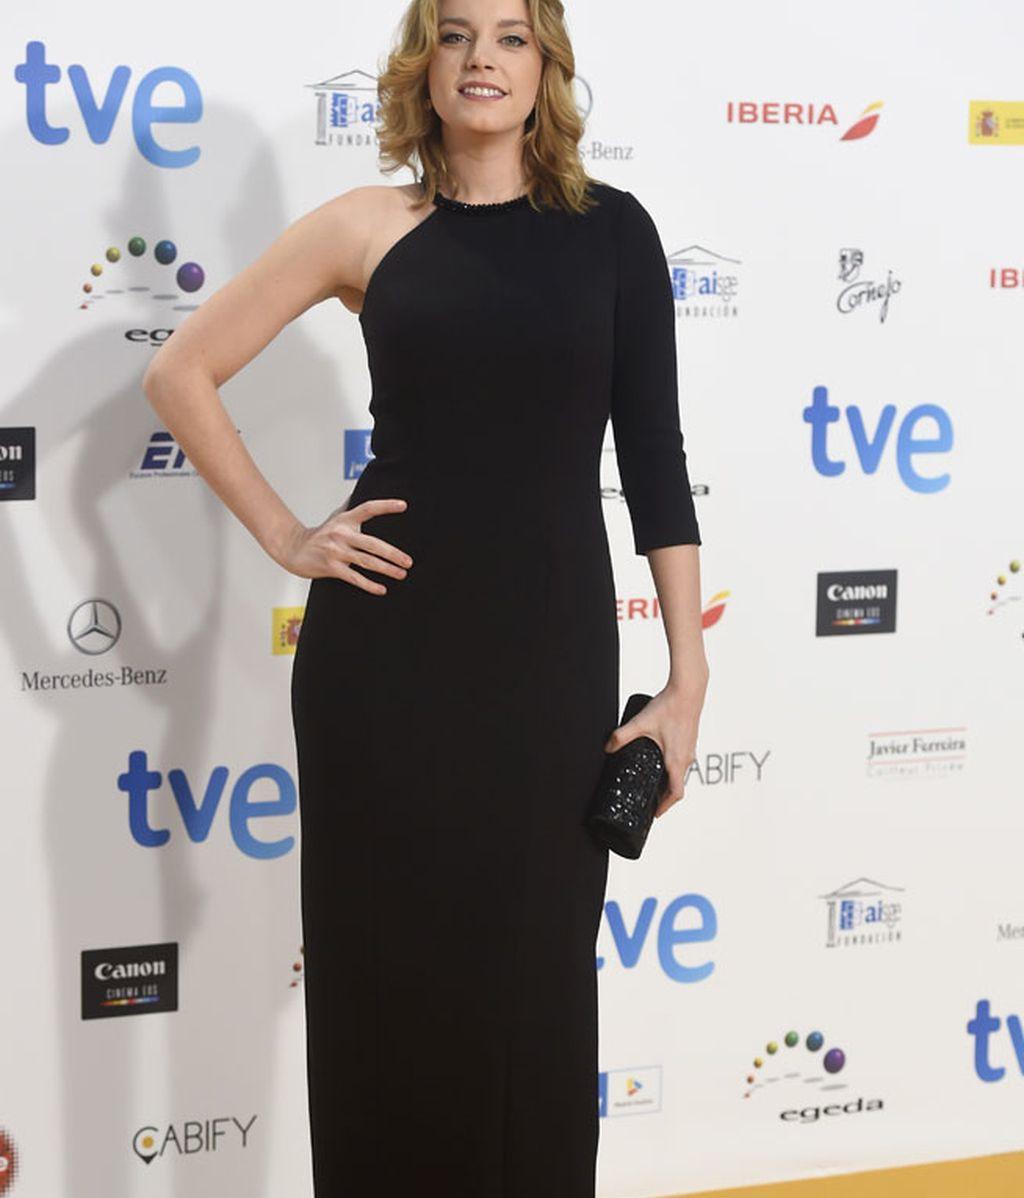 Carolina Bang lució un vestido negro asimétrico